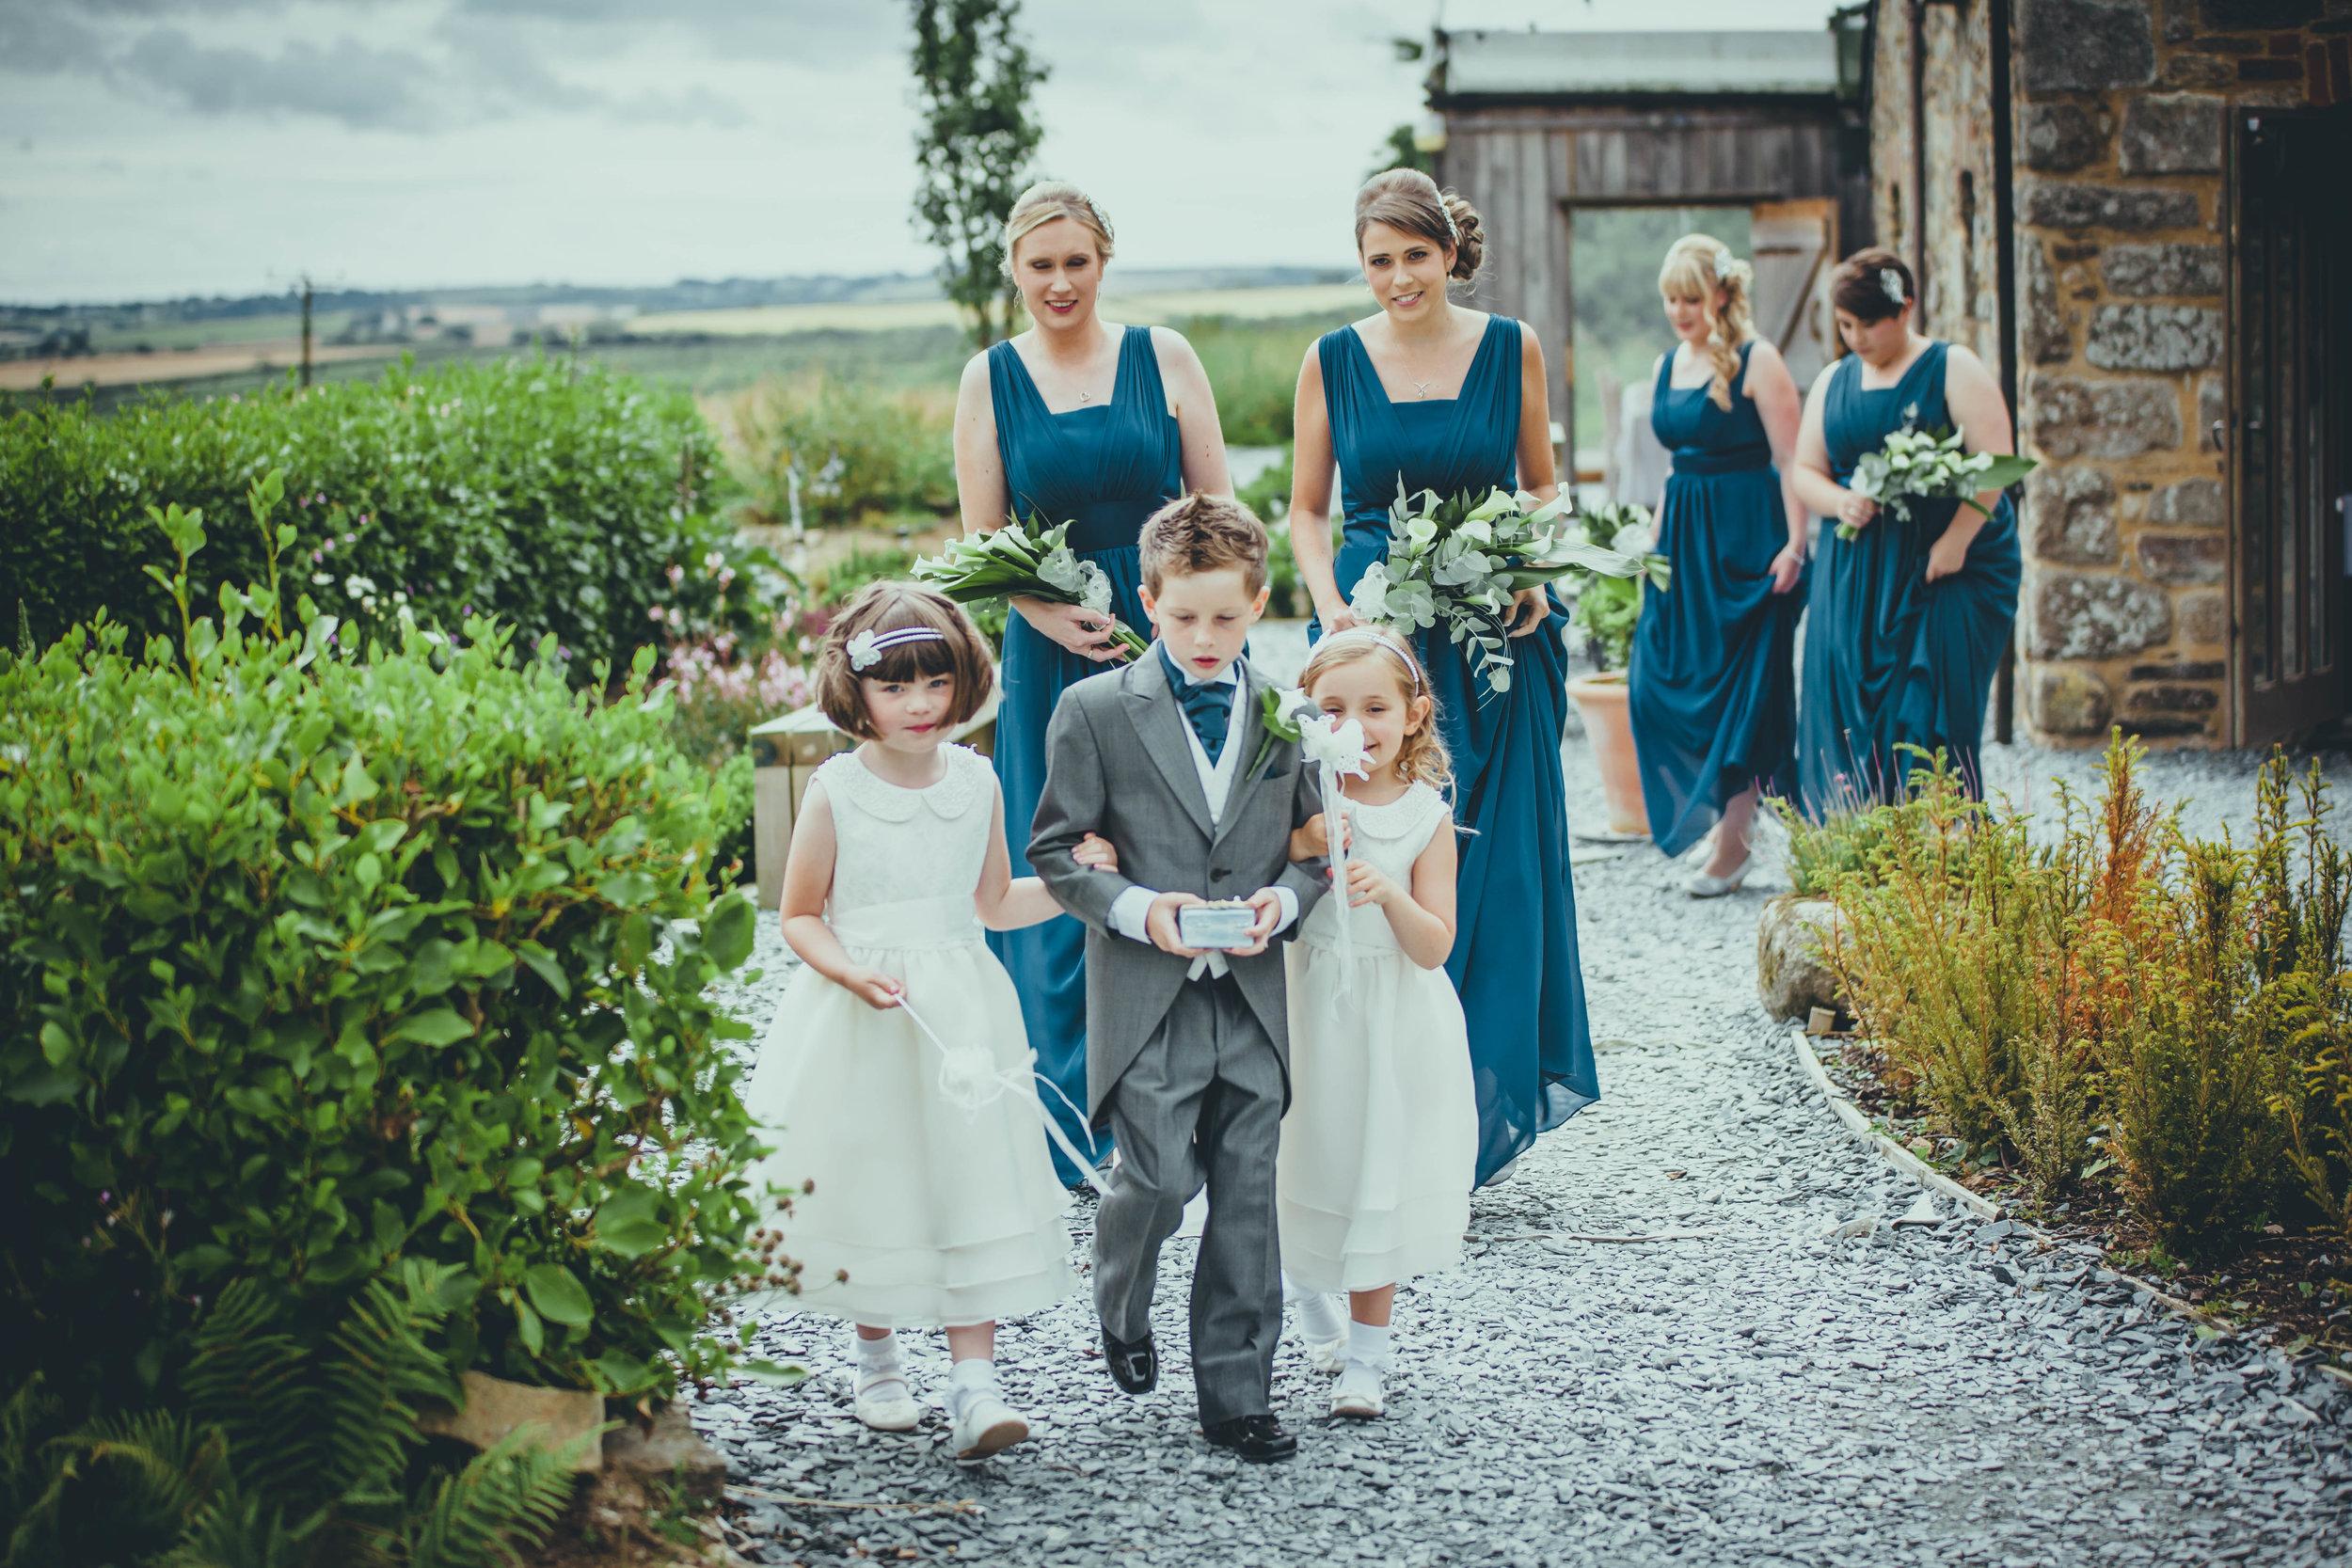 HOW ARD WEDDING PHOTOGRAPHY WEST MIDLANDS -1-4.JPG